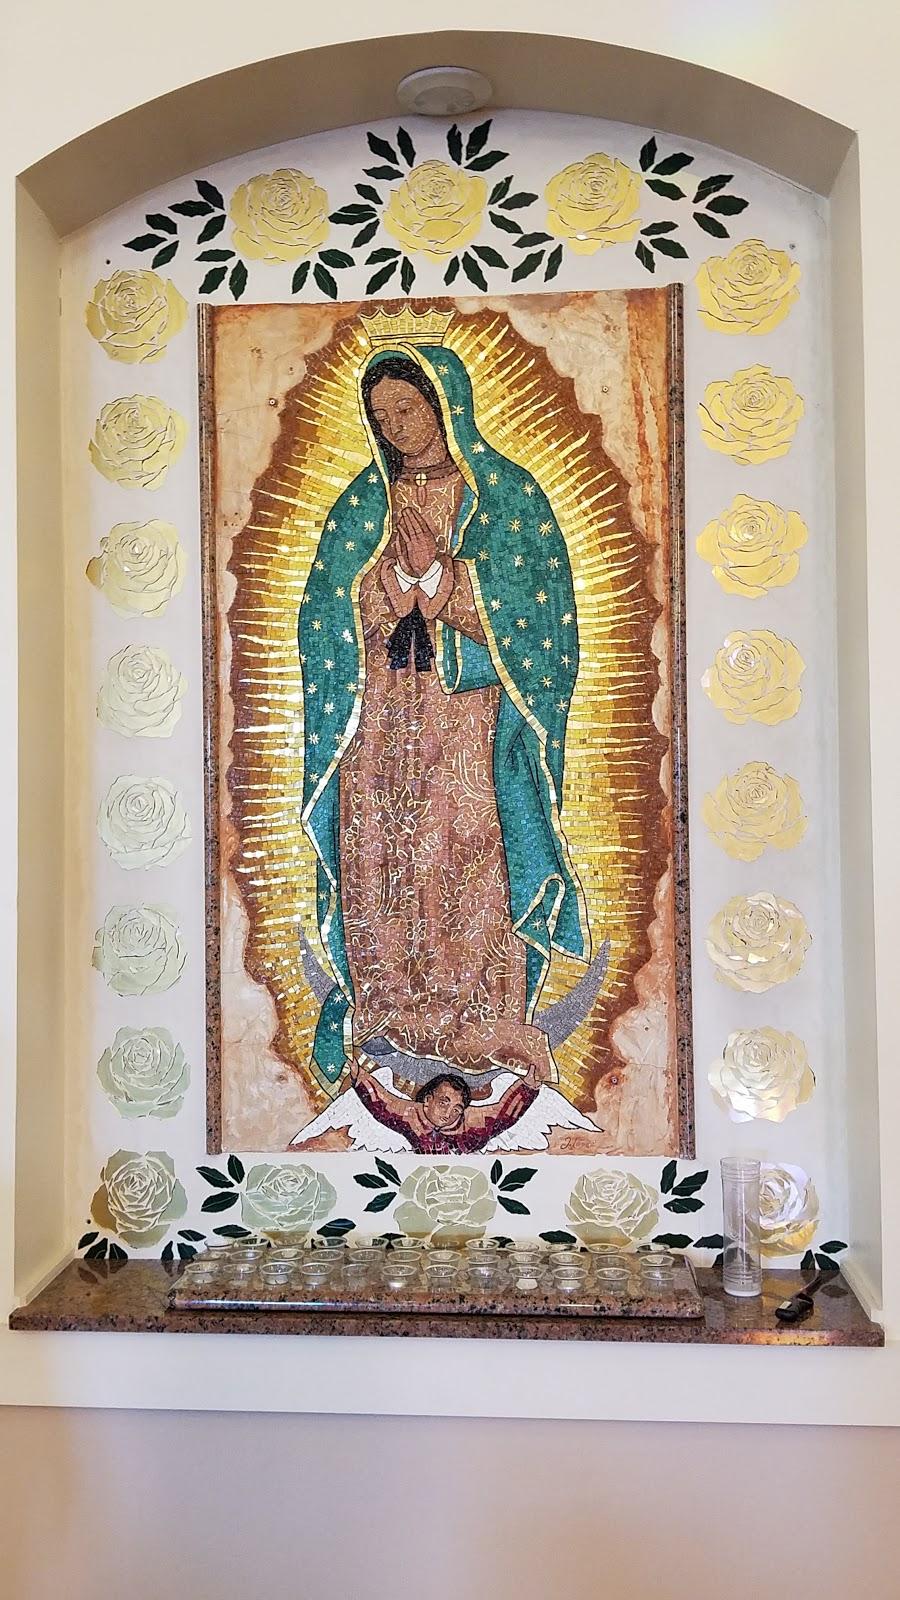 St. John The Evangelist Catholic Church - church  | Photo 8 of 10 | Address: 105 Ranch Rd 1431, Marble Falls, TX 78654, USA | Phone: (830) 693-5134